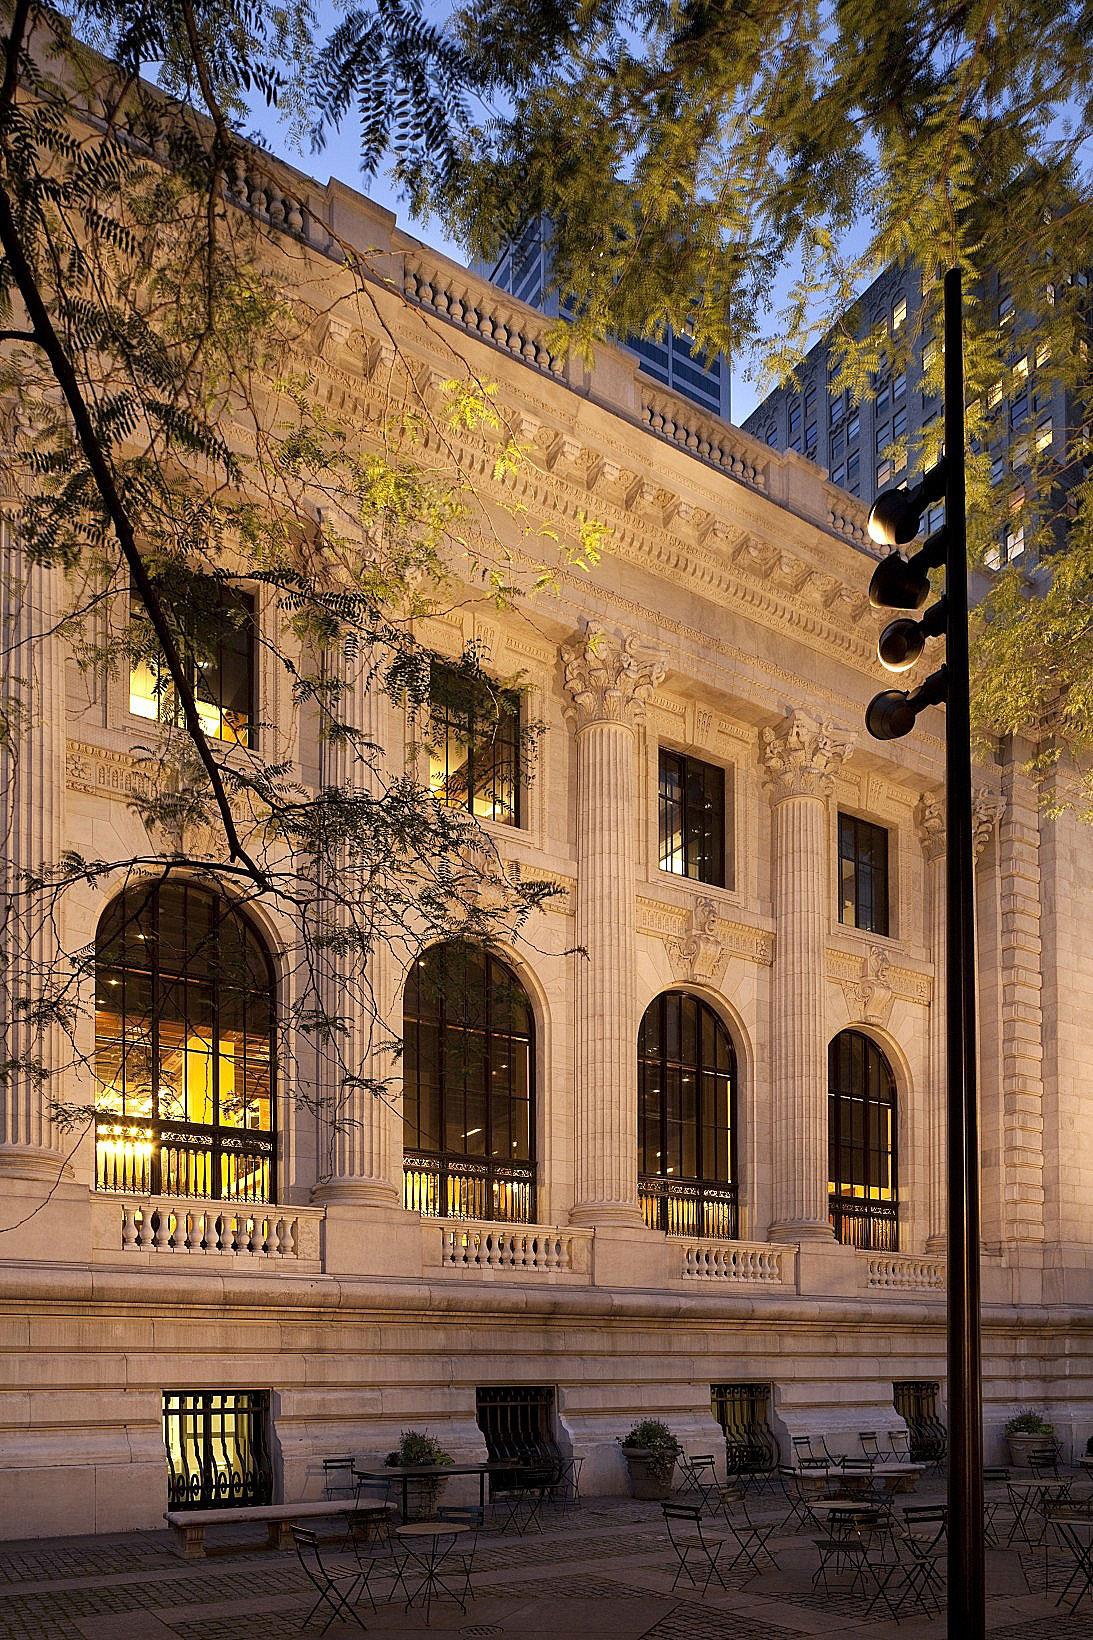 Beamer gross  eur erco new york public library stephen a schwarzman building image 1 2